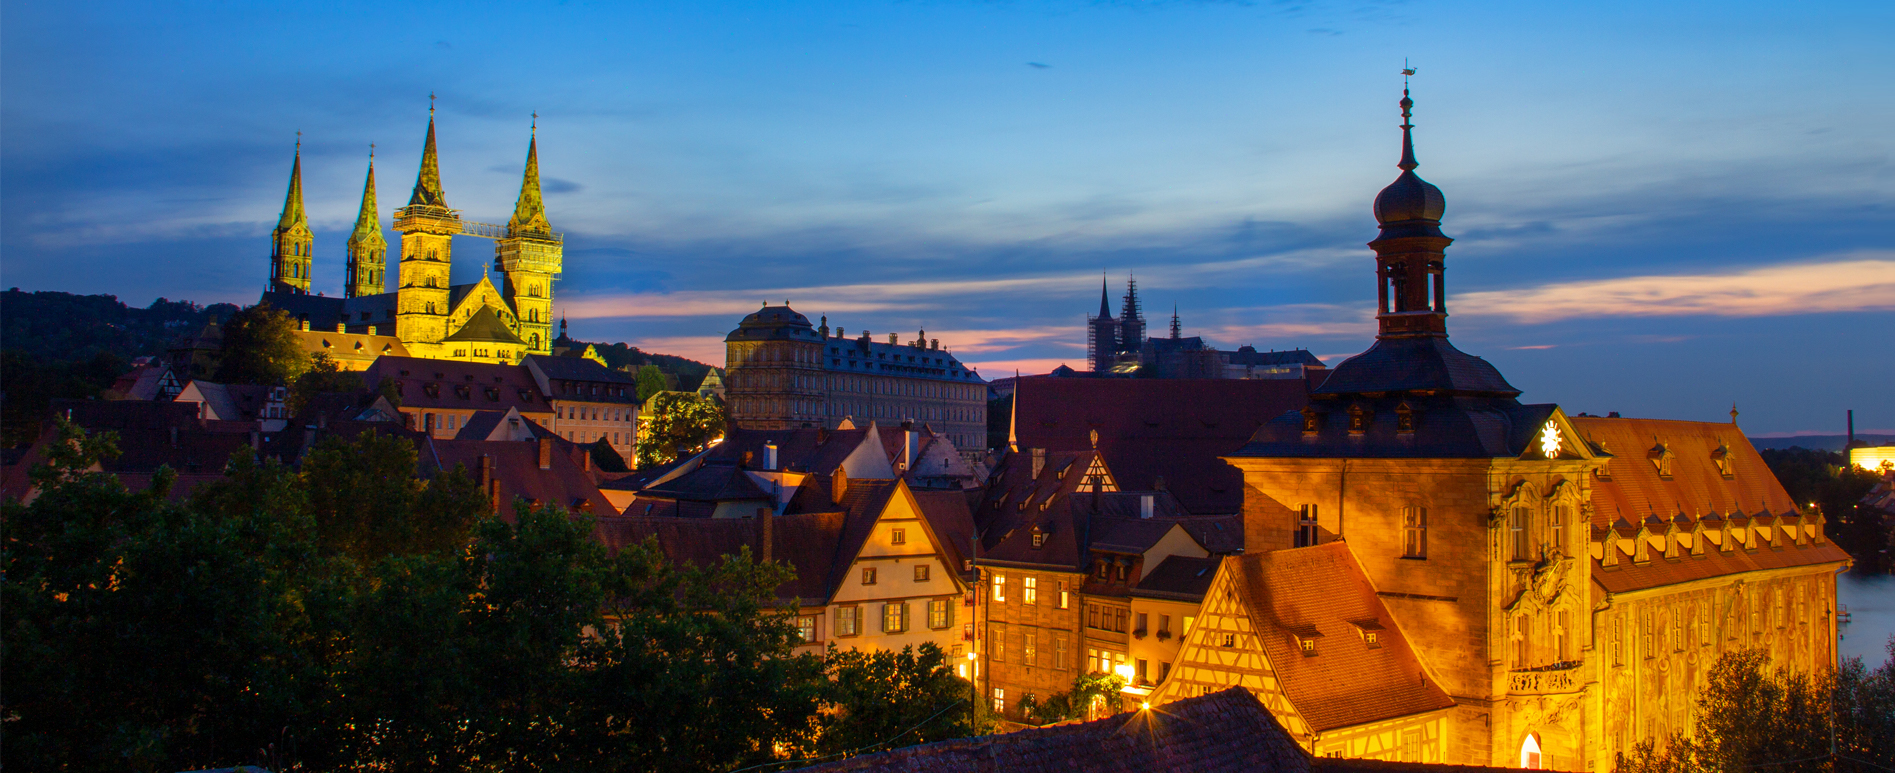 Bamberg-blaue-Stunde-Startslider